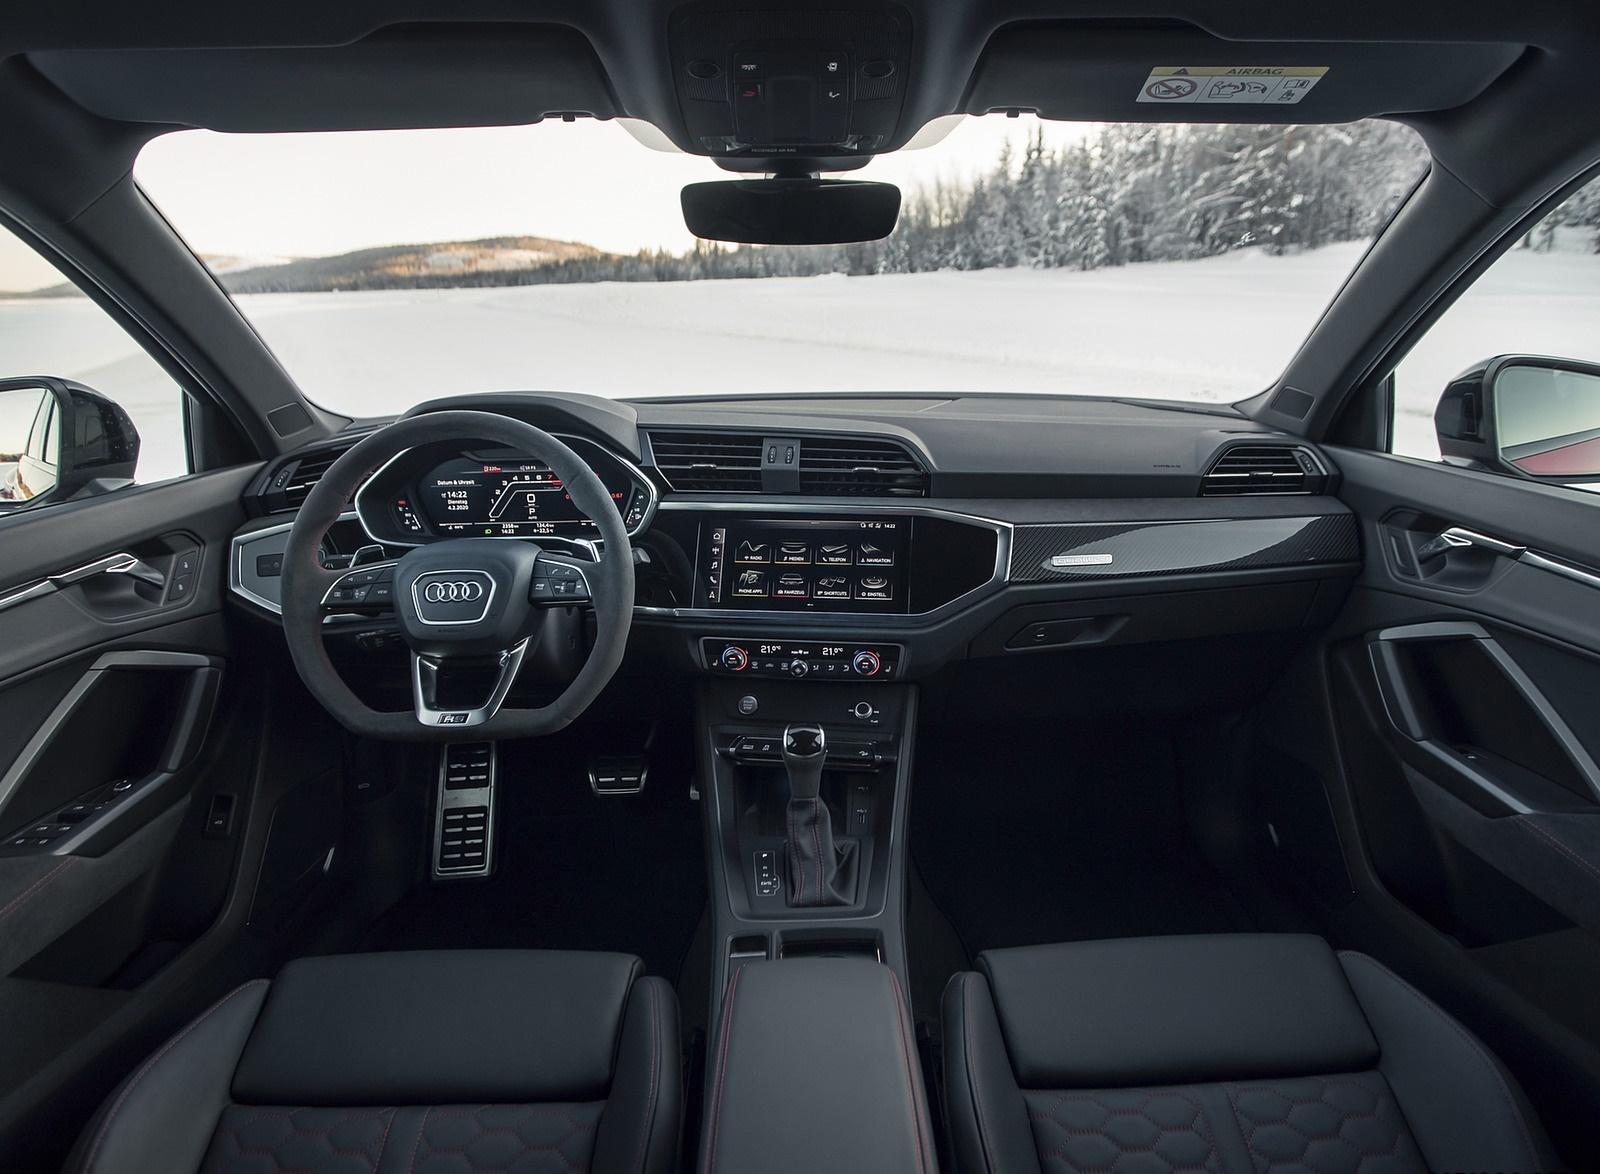 2020 Audi RS Q3 Interior Cockpit Wallpapers #23 of 116